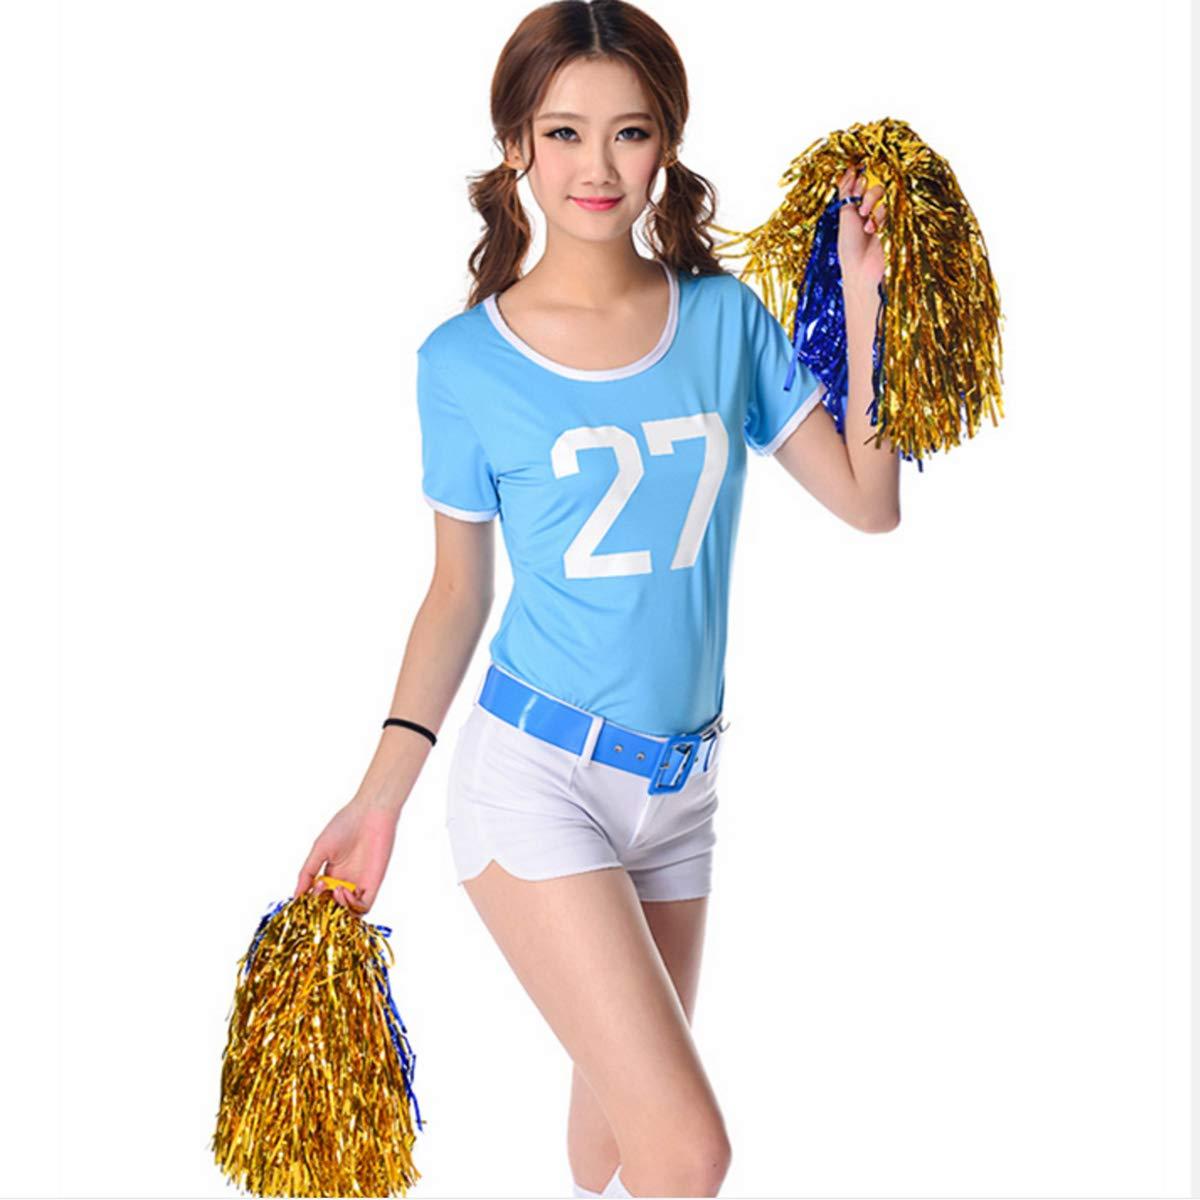 6 Pcs Cheerleading Pom Poms Plastic Cheerleader Pom Poms Party Costume Accessory Set Ball Dance Fancy Dress Night Party Sports Pompoms Cheer STUDYY .